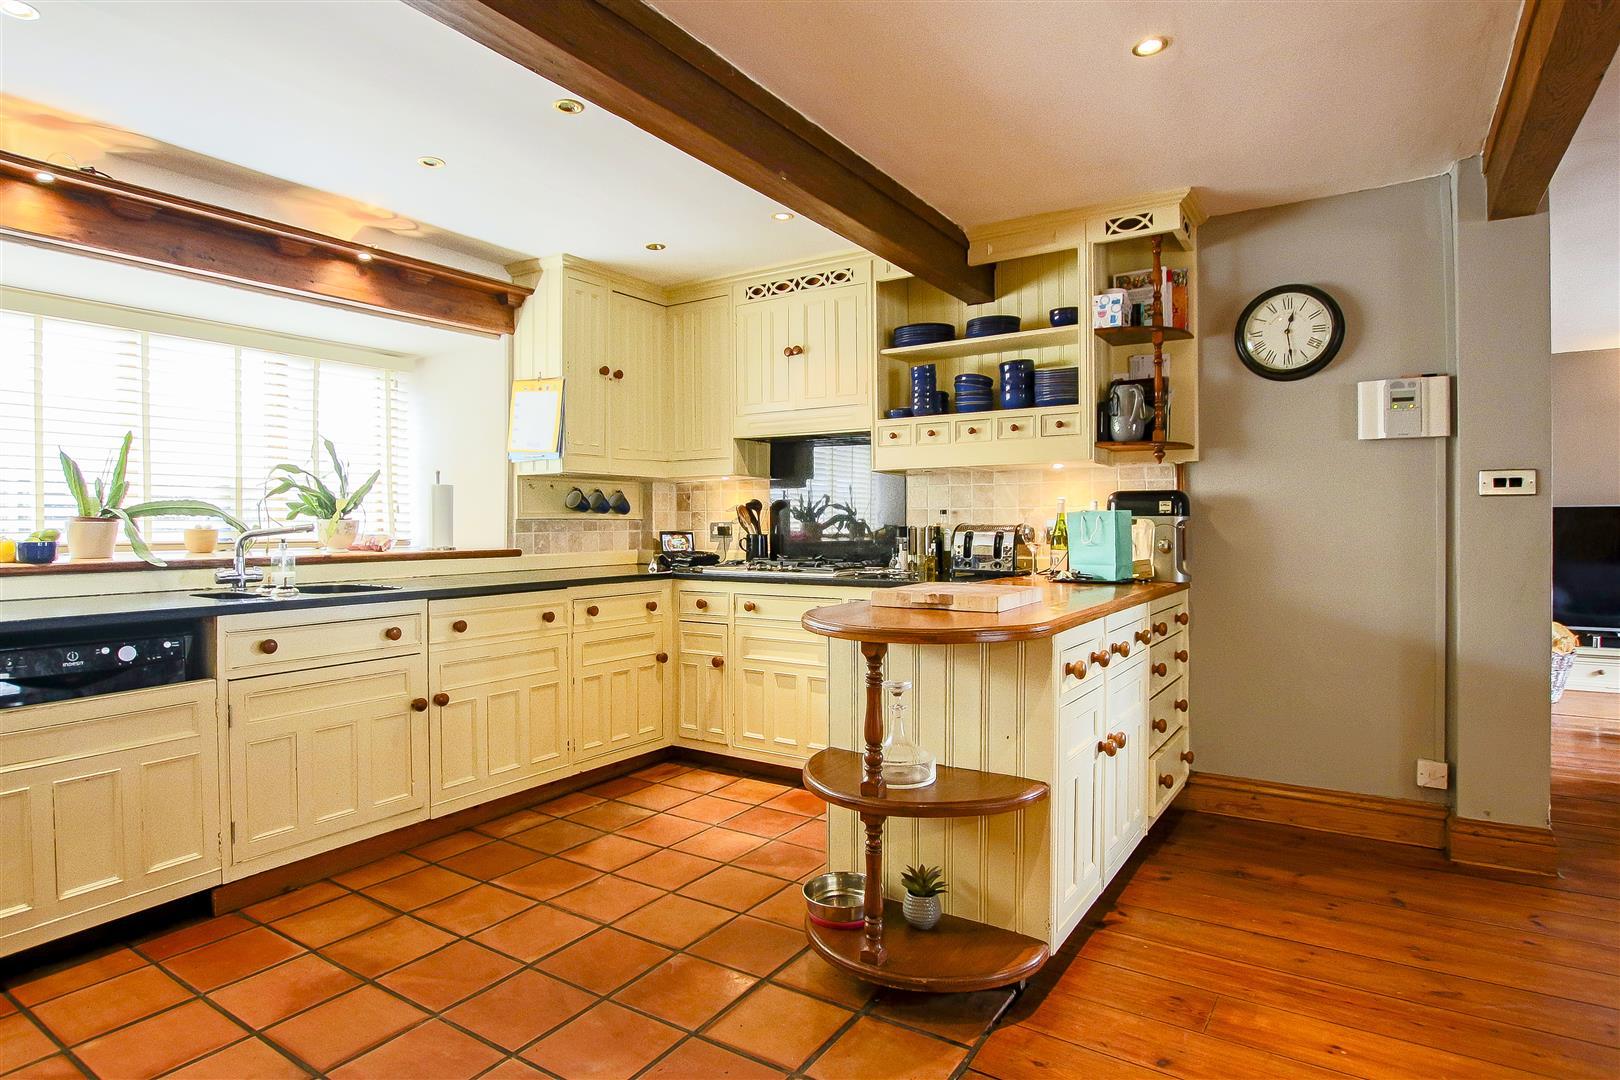 5 Bedroom Barn Conversion For Sale - 11.jpg